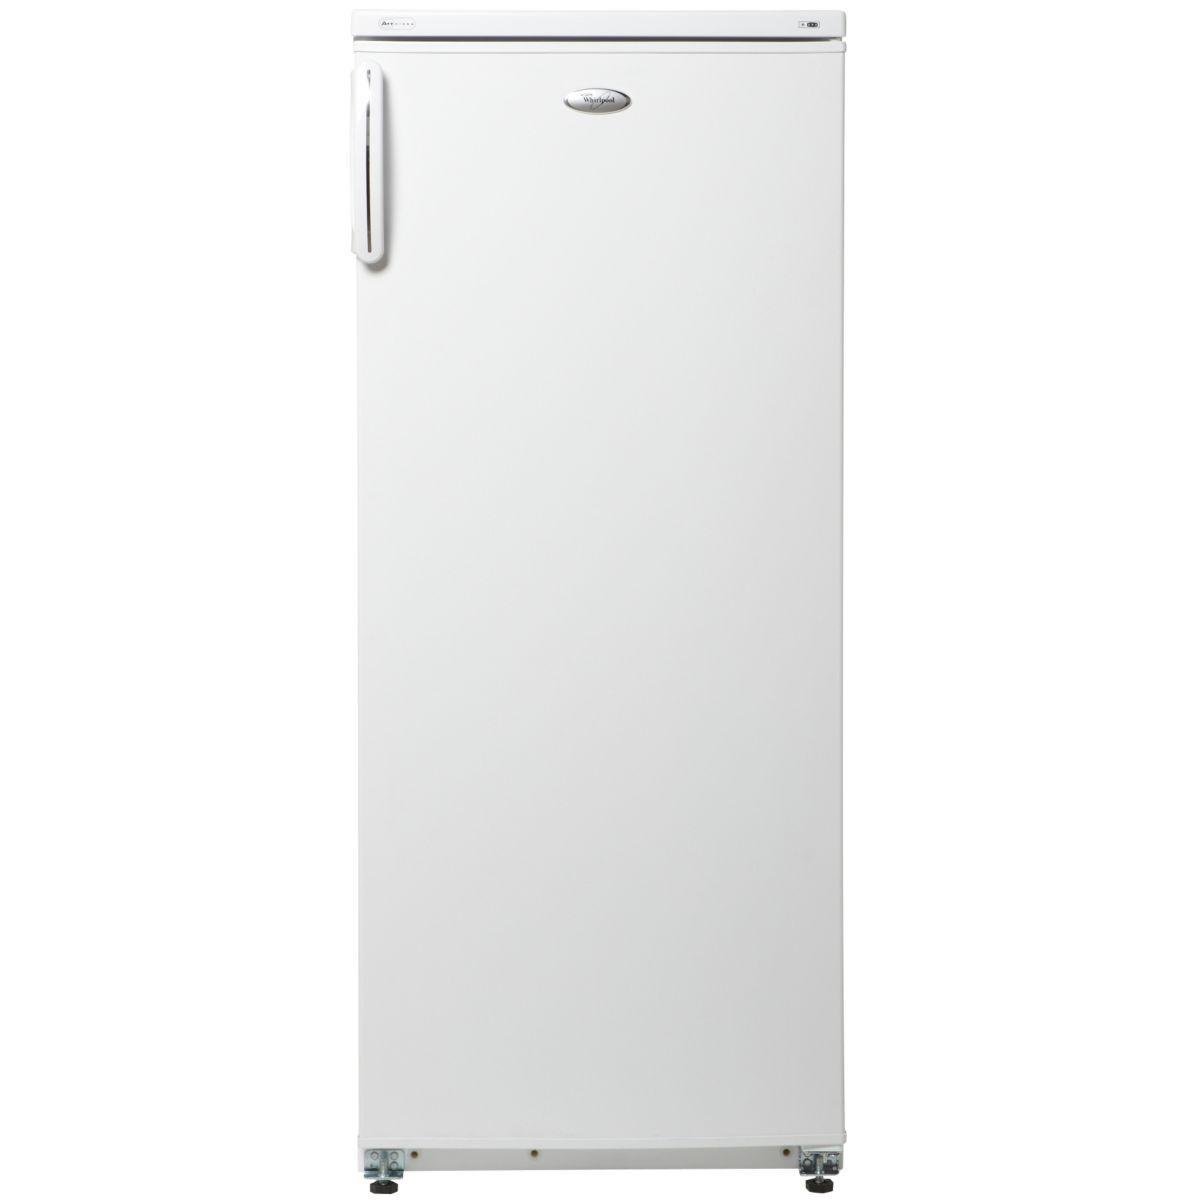 Réfrigérateur 1 Porte Whirlpool Arc 140